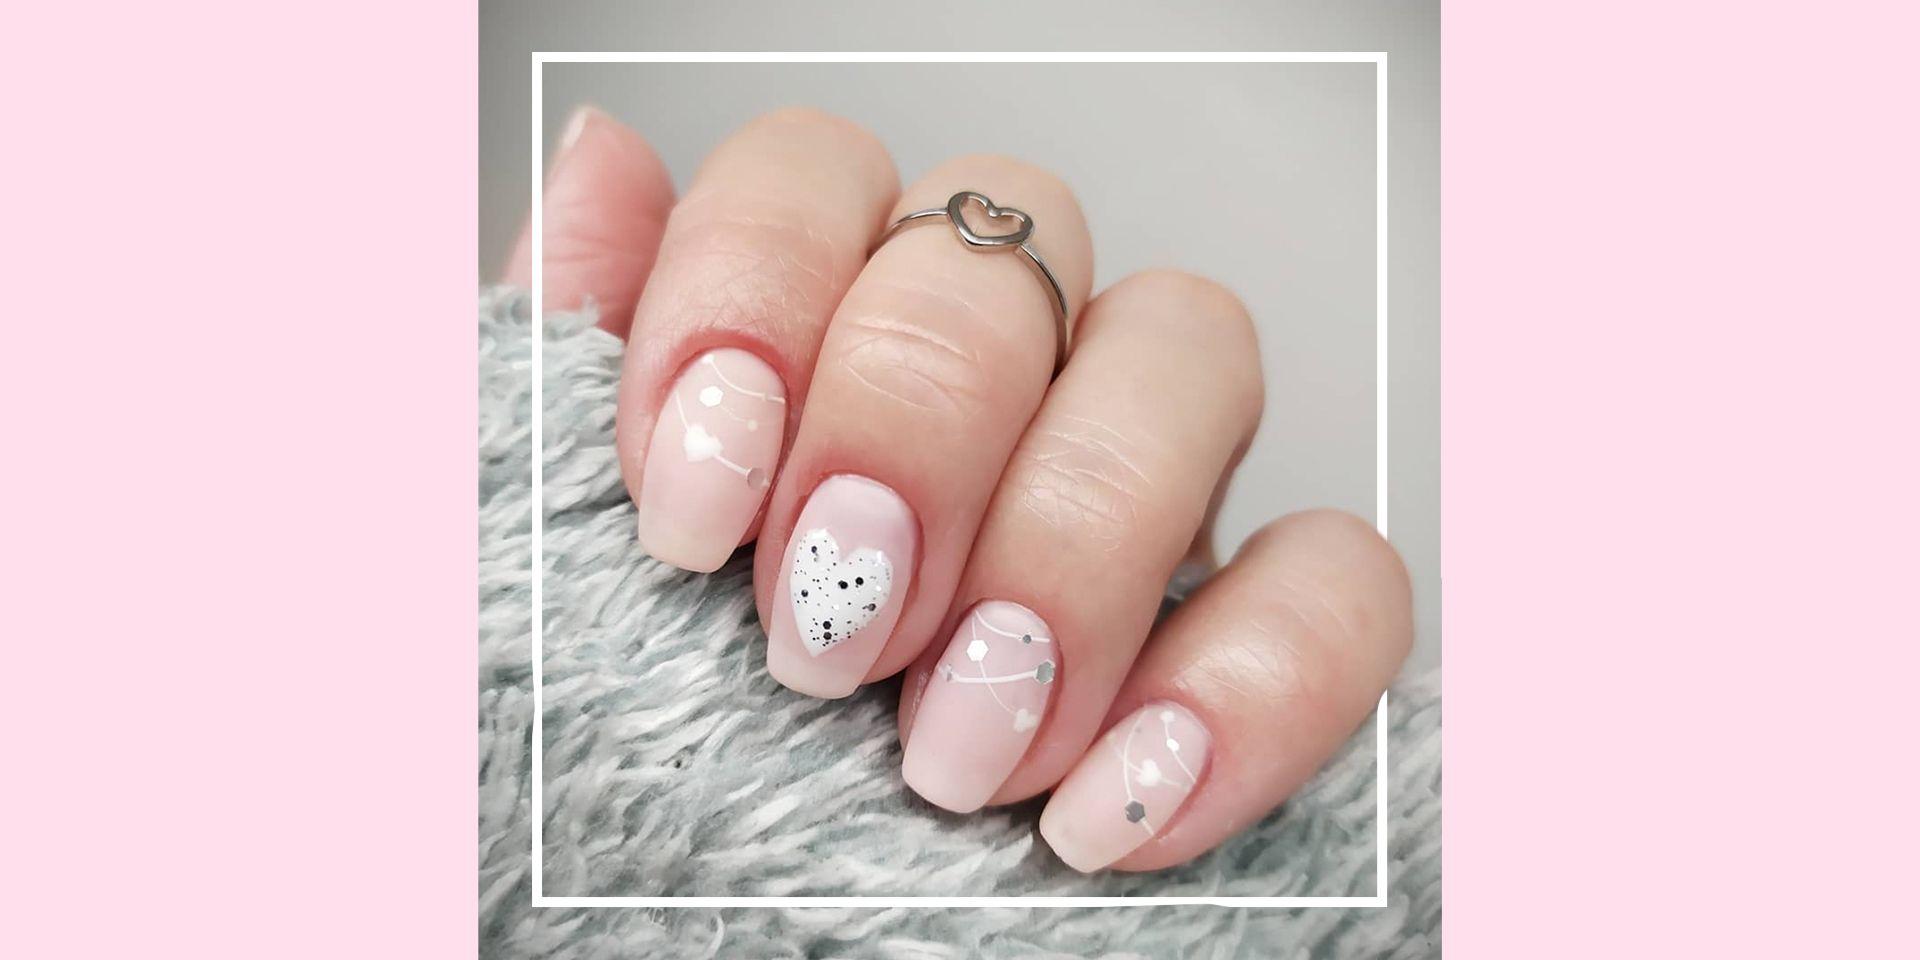 16 Fun Valentine's Day Nail Art Designs   V Day Nail Inspiration